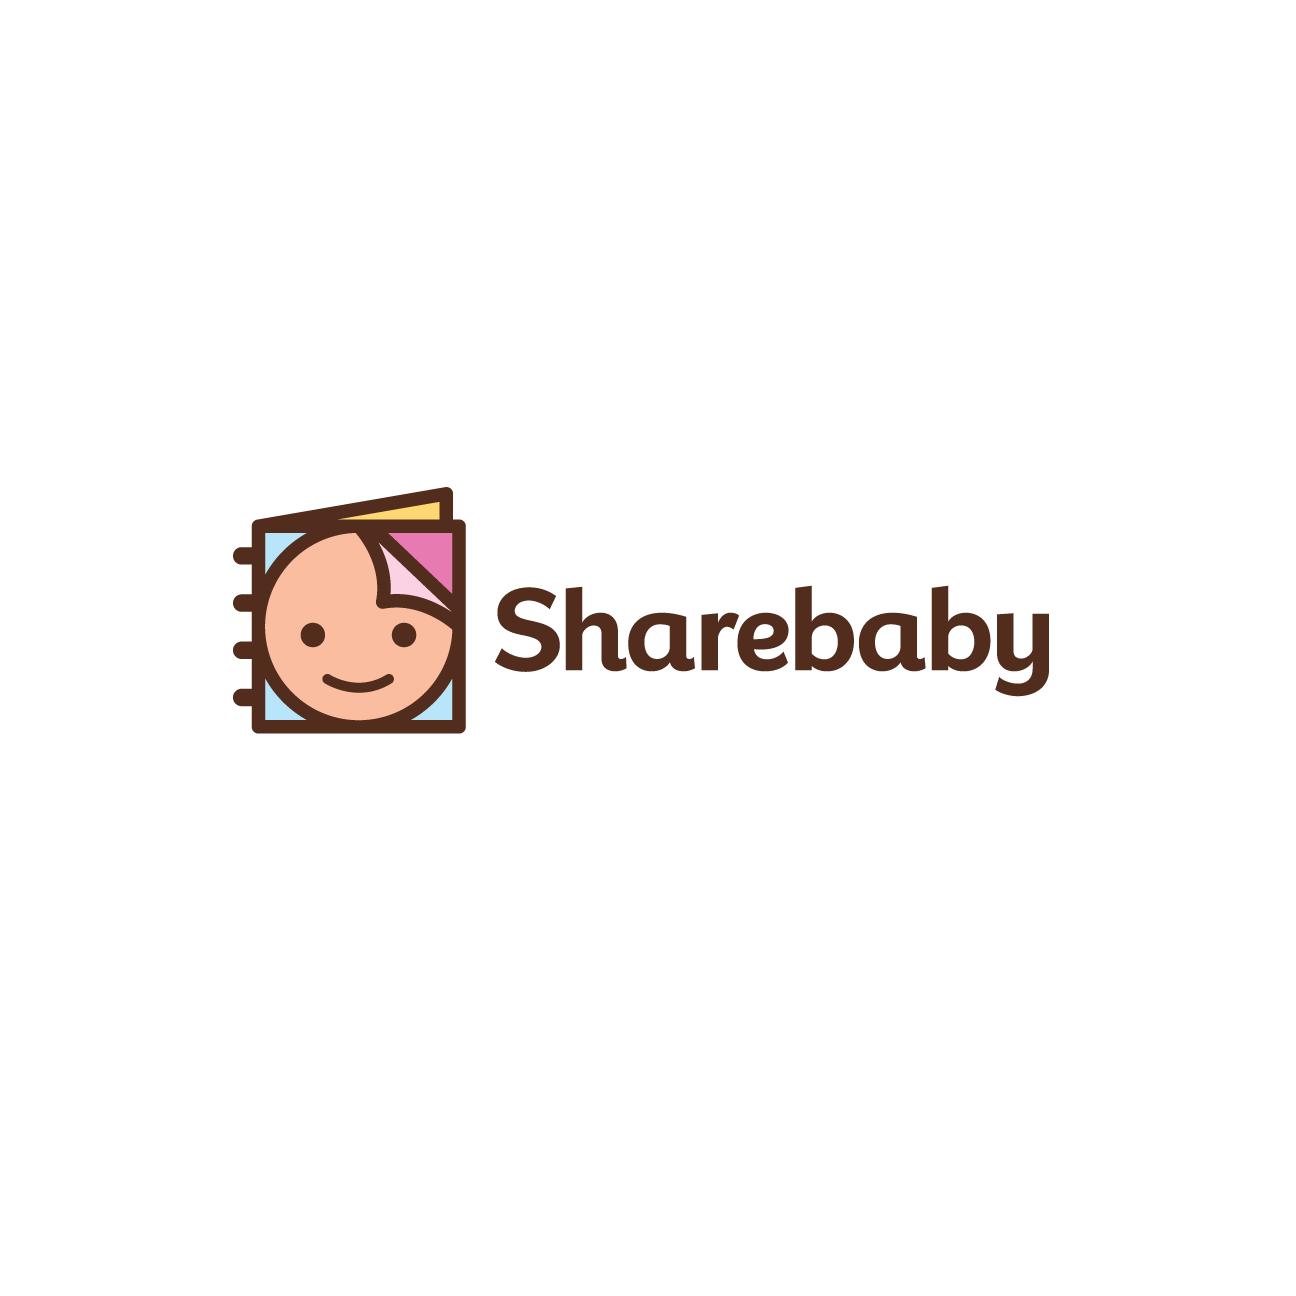 Sharebaby Logo